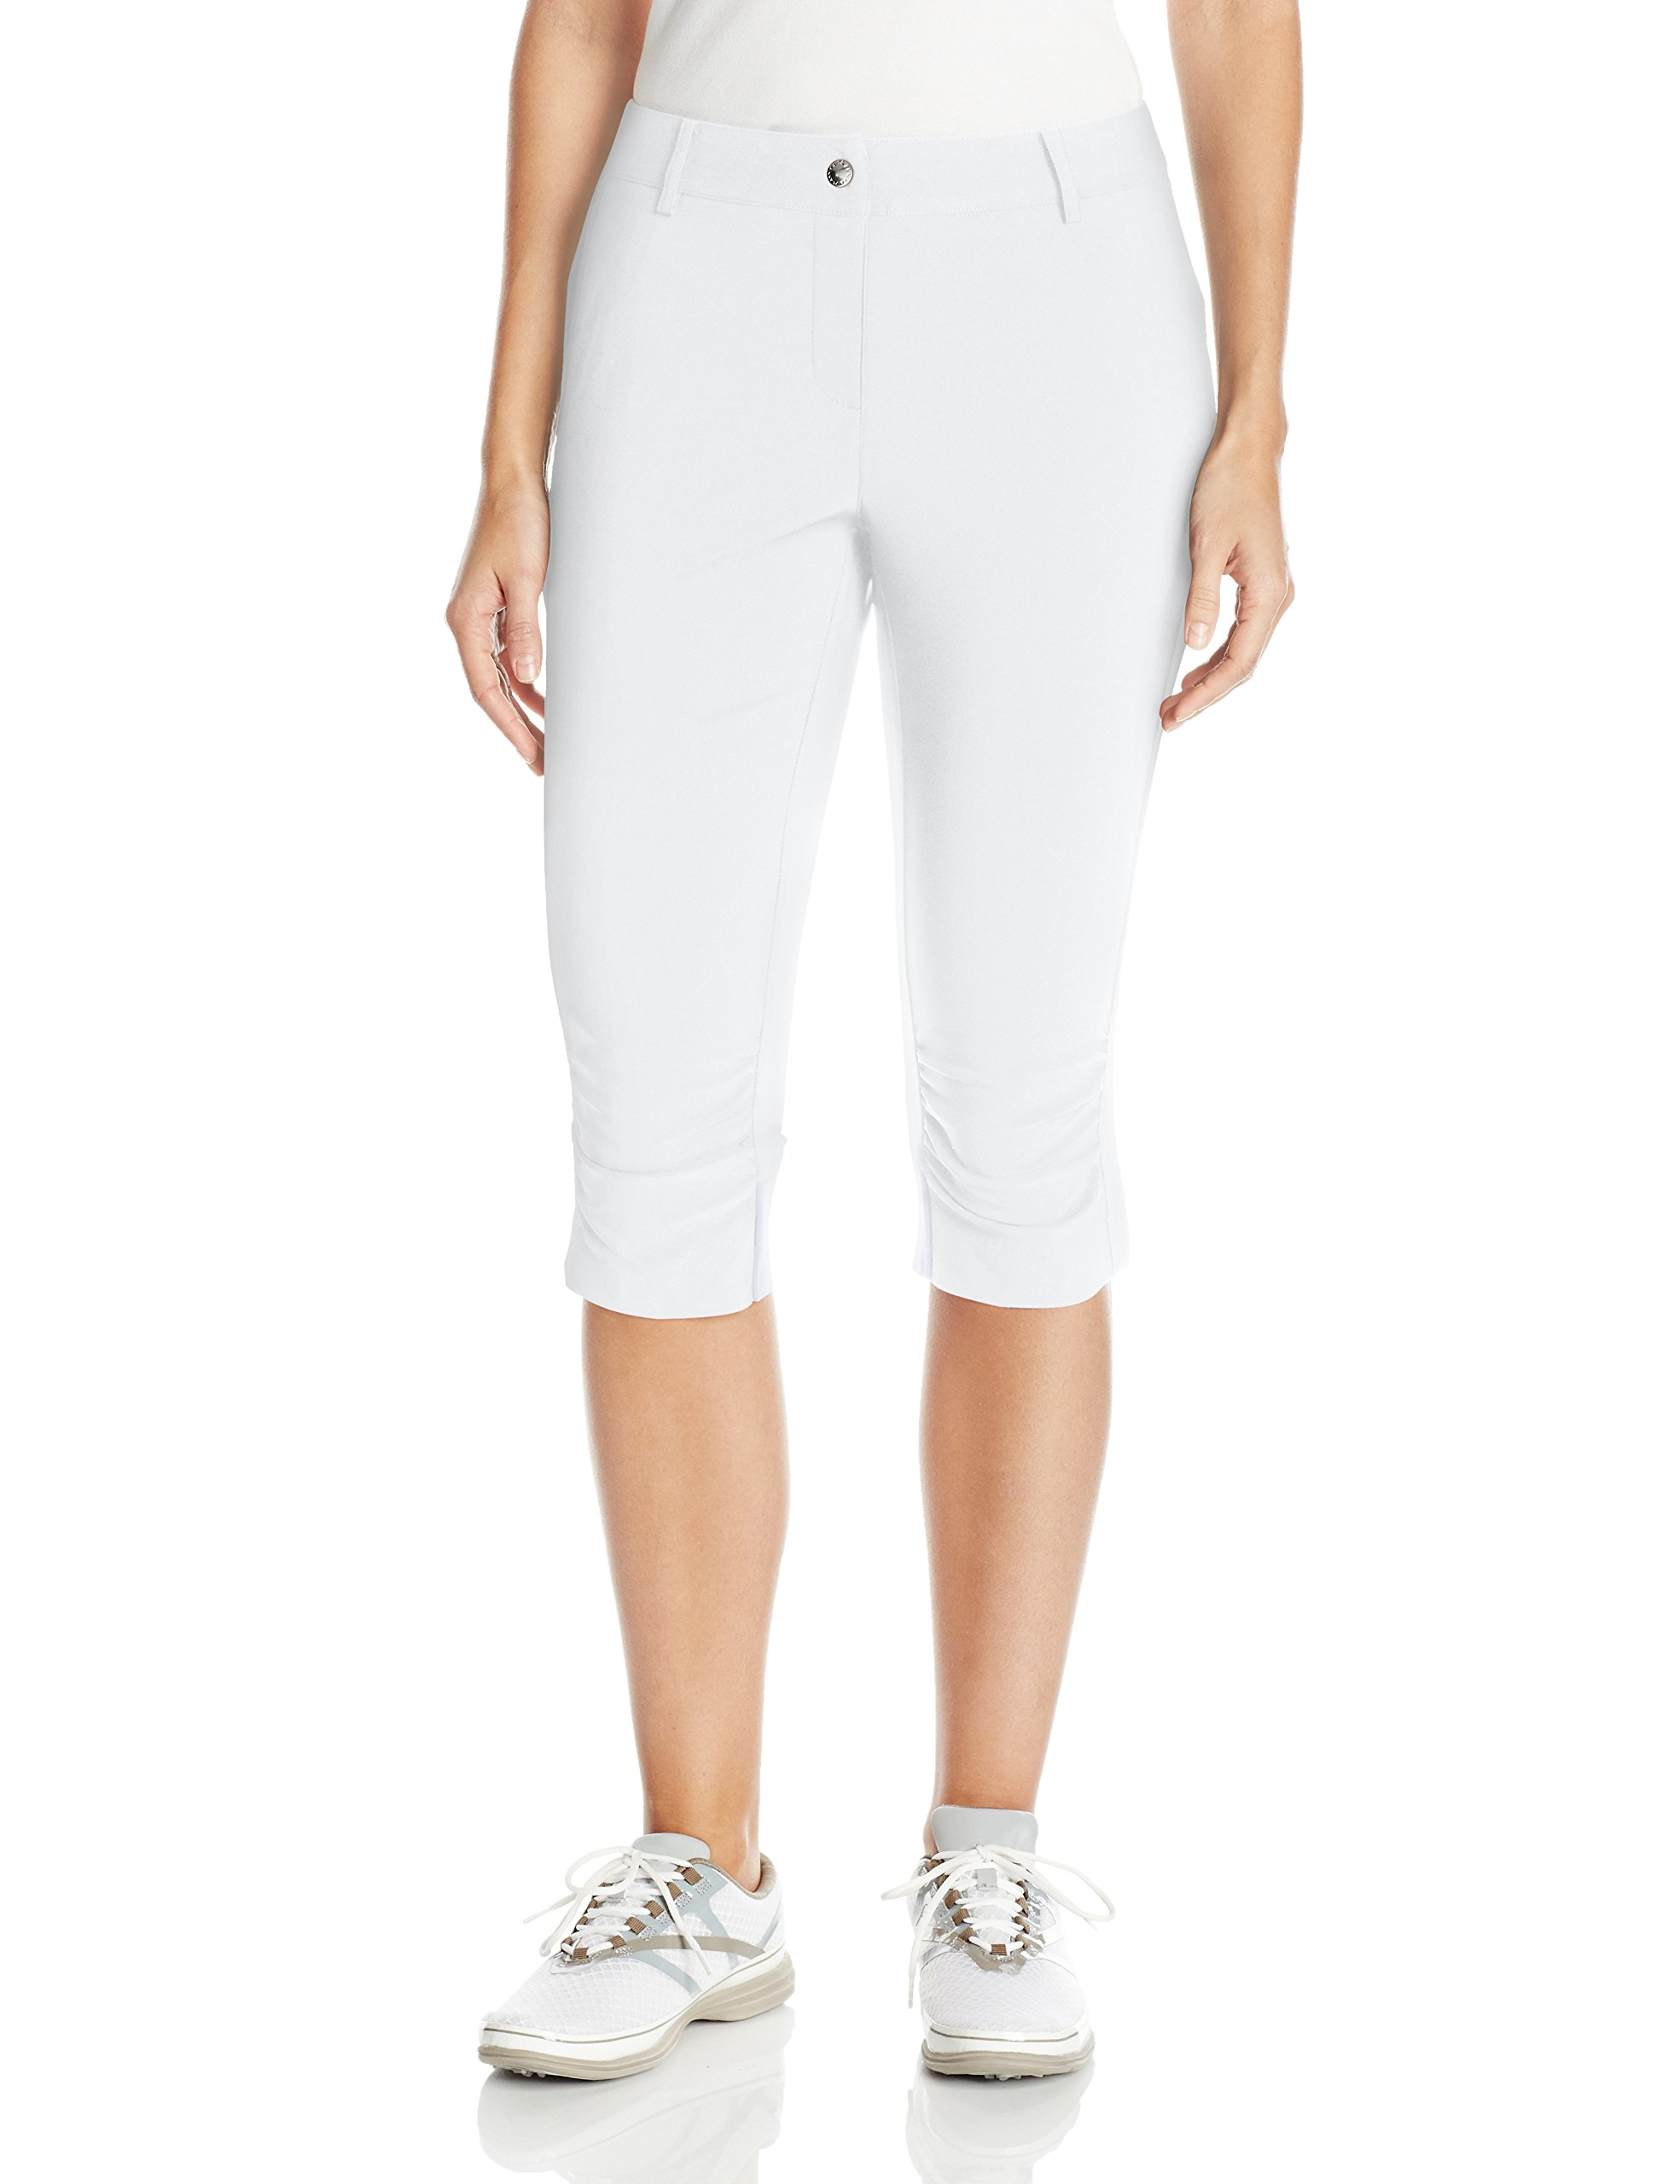 Cutter & Buck Annika Women's Moisture Wicking, UPF 50+, Stretch Morgain Long Short, White, 0